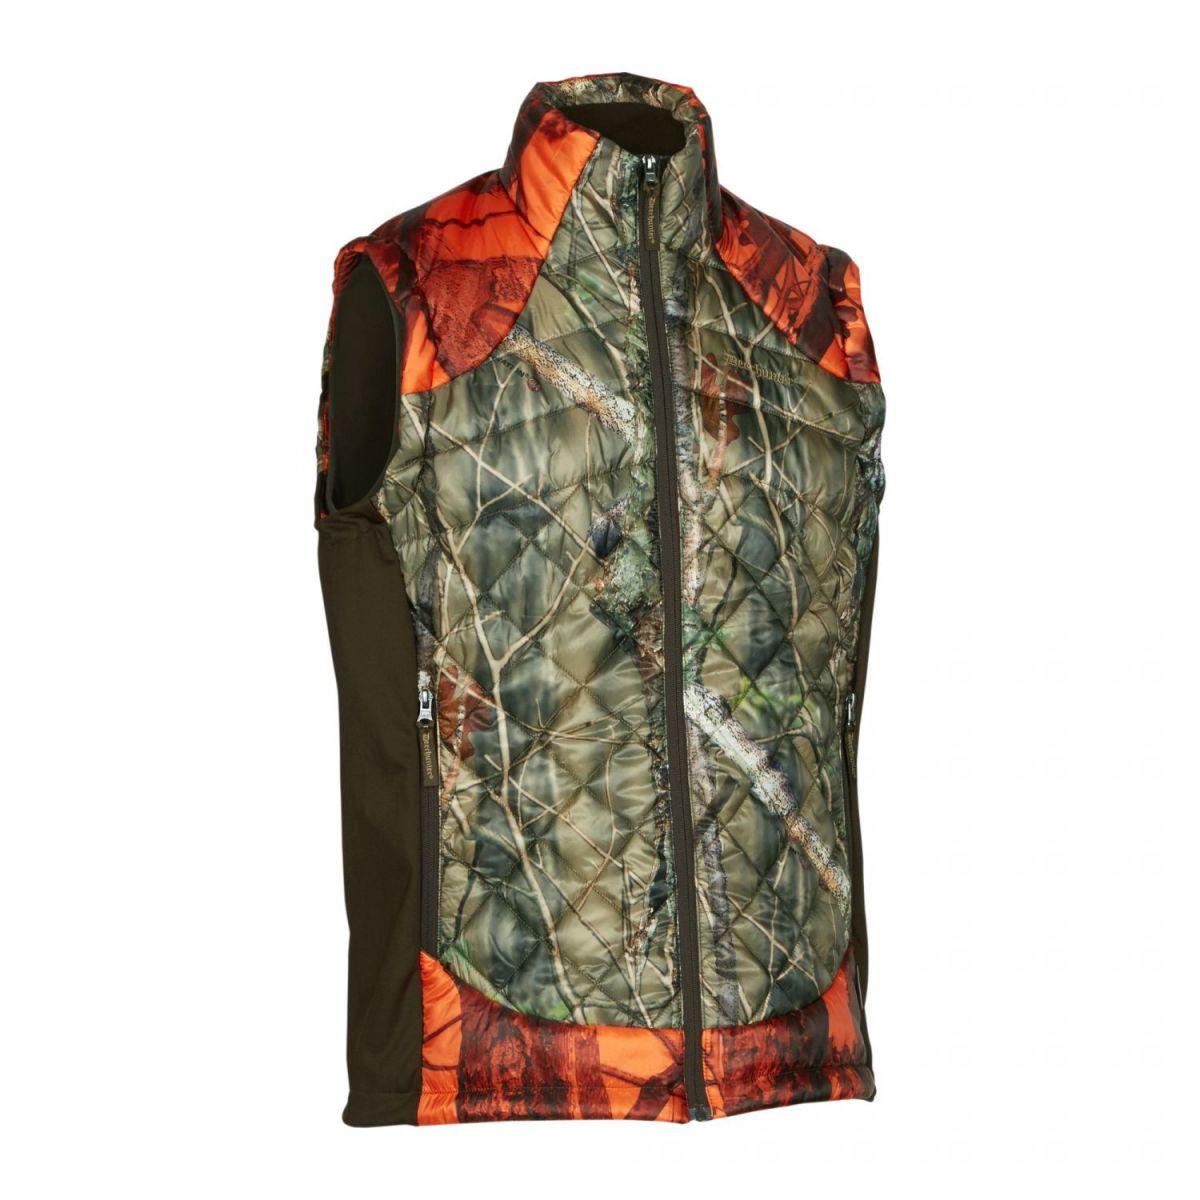 Жилет Deerhunter Cumberland Quilted Waistcoat Innovation GH Blaze